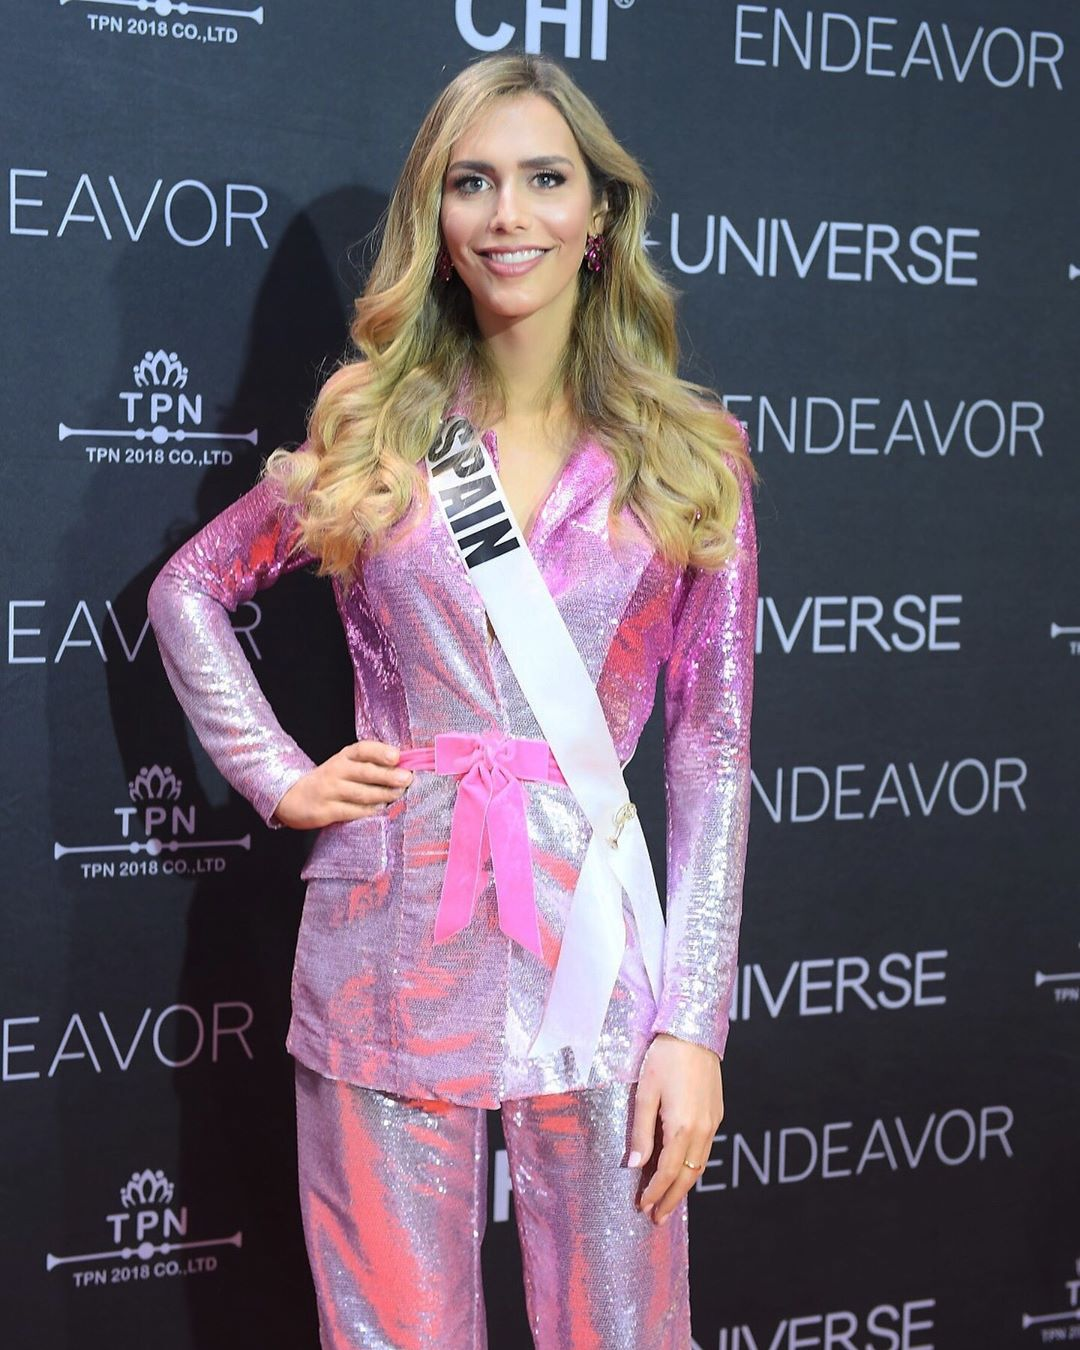 angela ponce, miss espana universo 2018. - Página 18 46544511